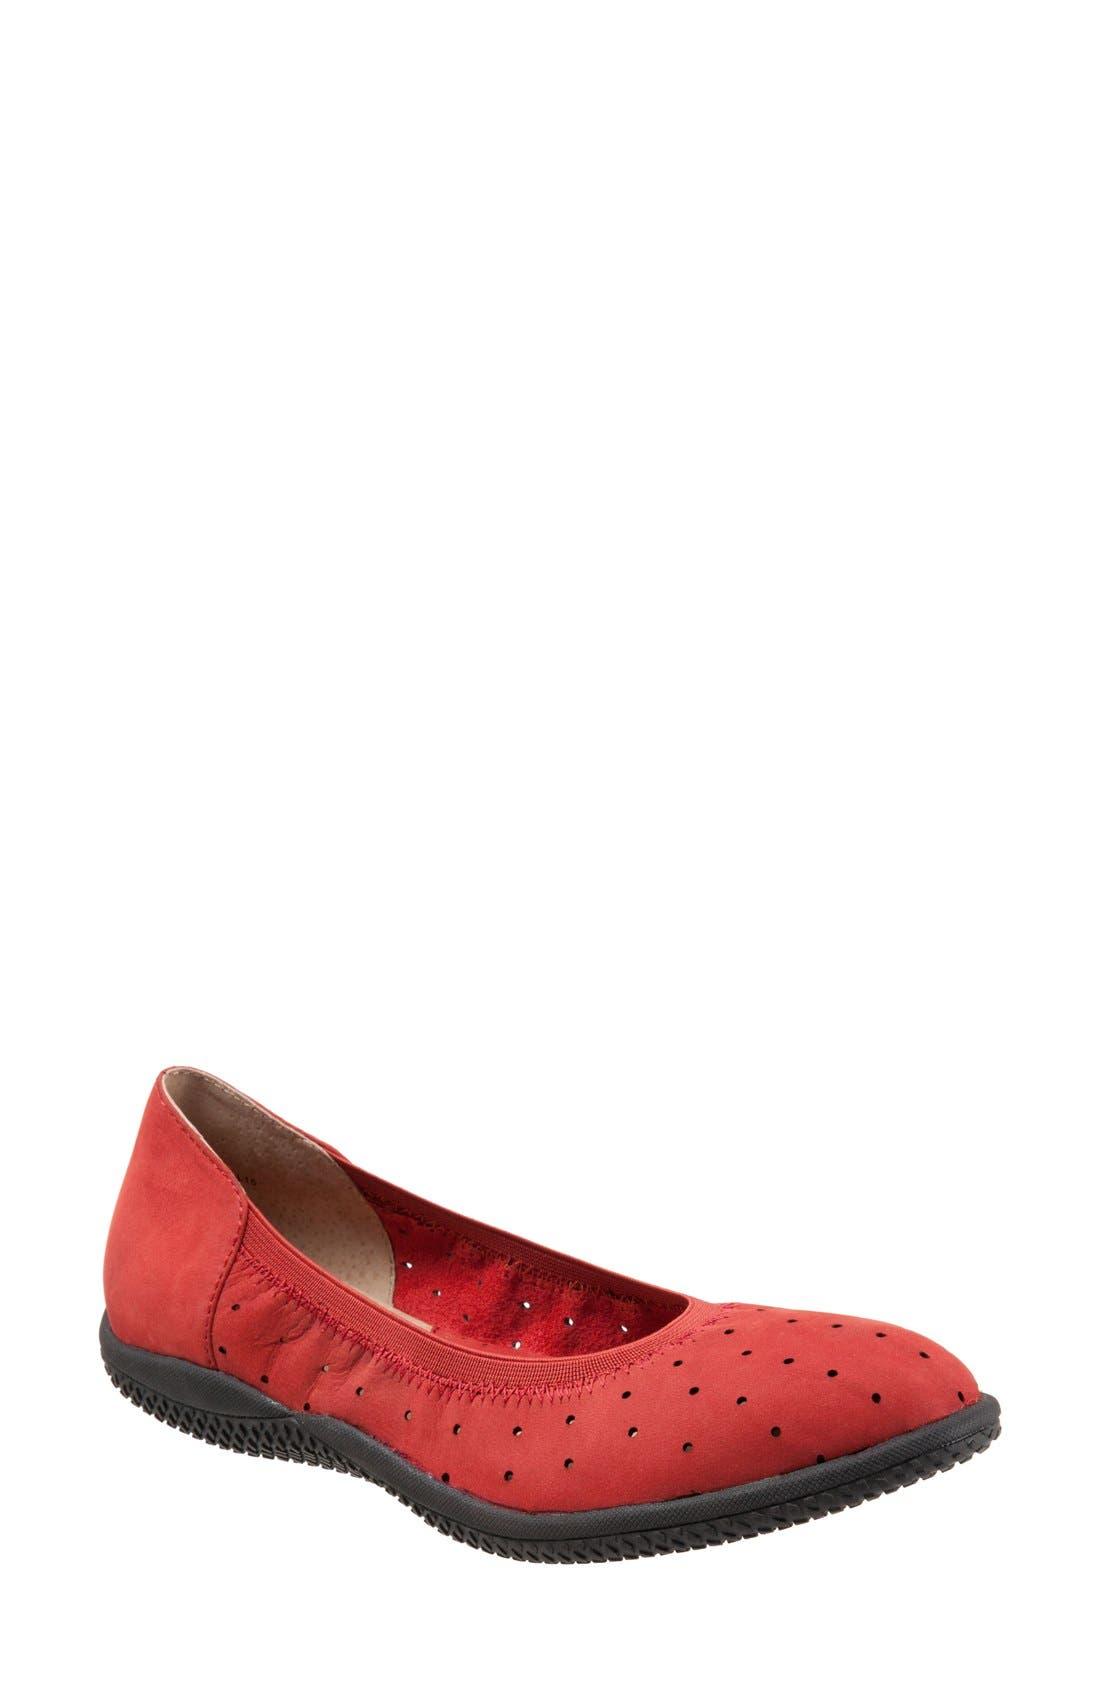 Main Image - SoftWalk® 'Hampshire' Dot Perforated Ballet Flat (Women)